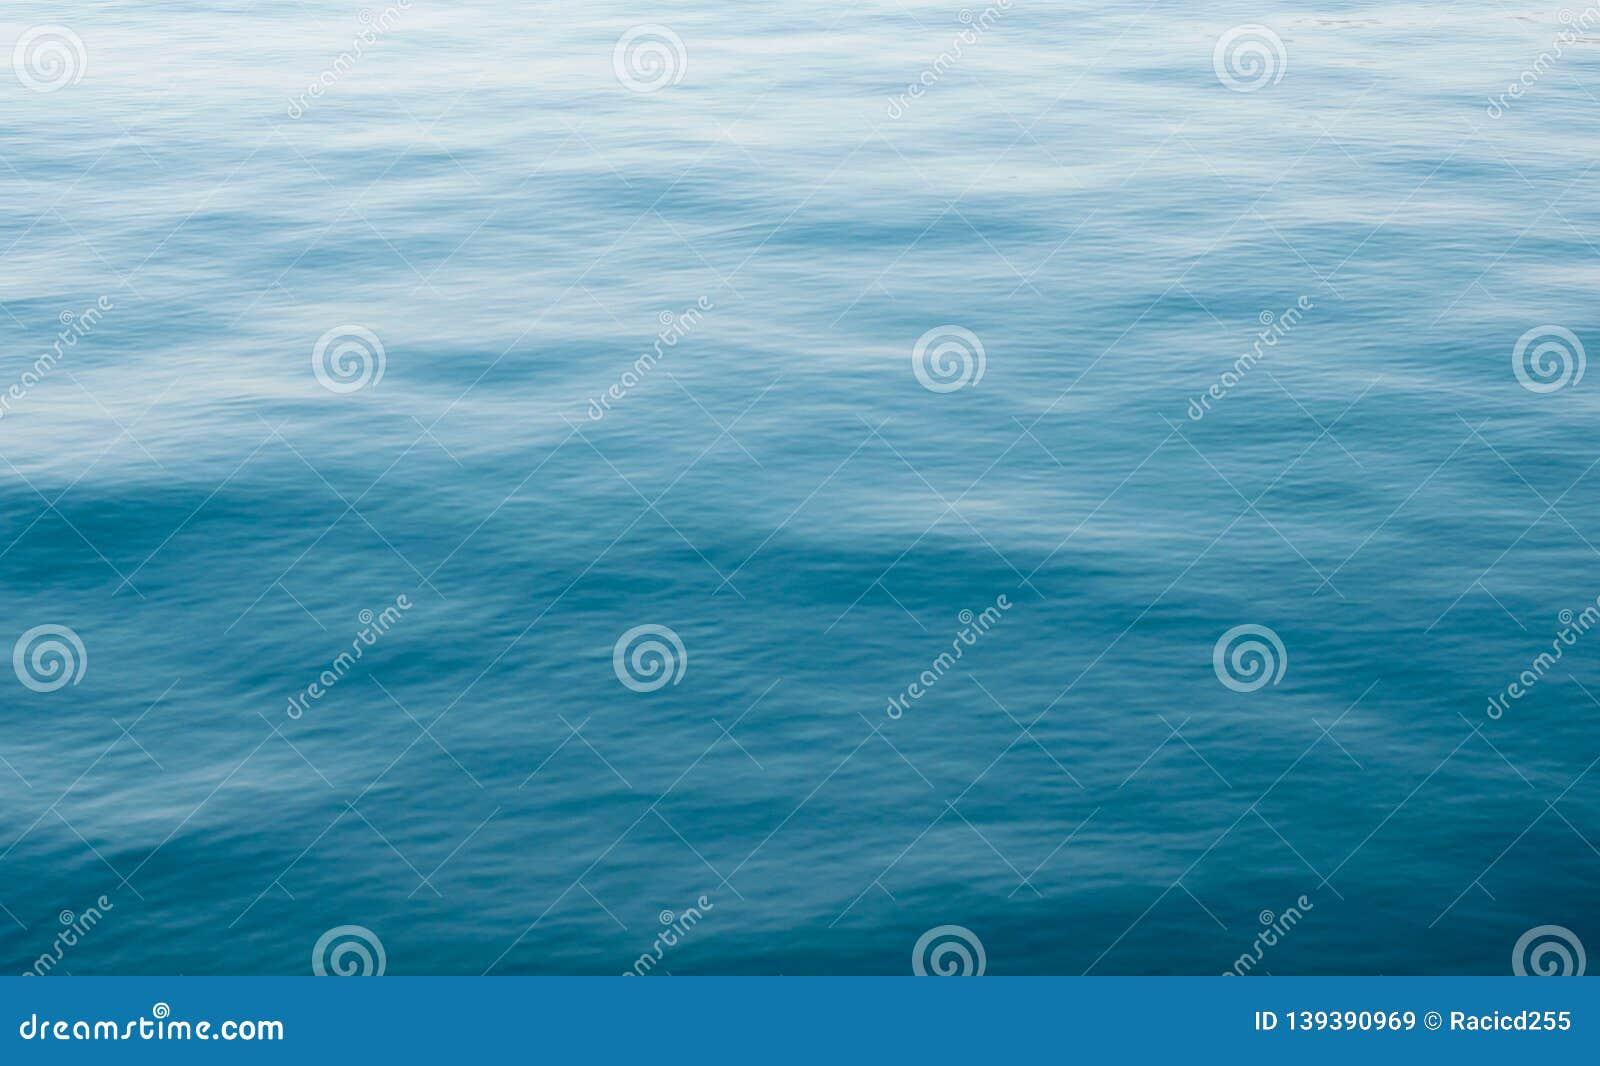 Ocean textured blue water background